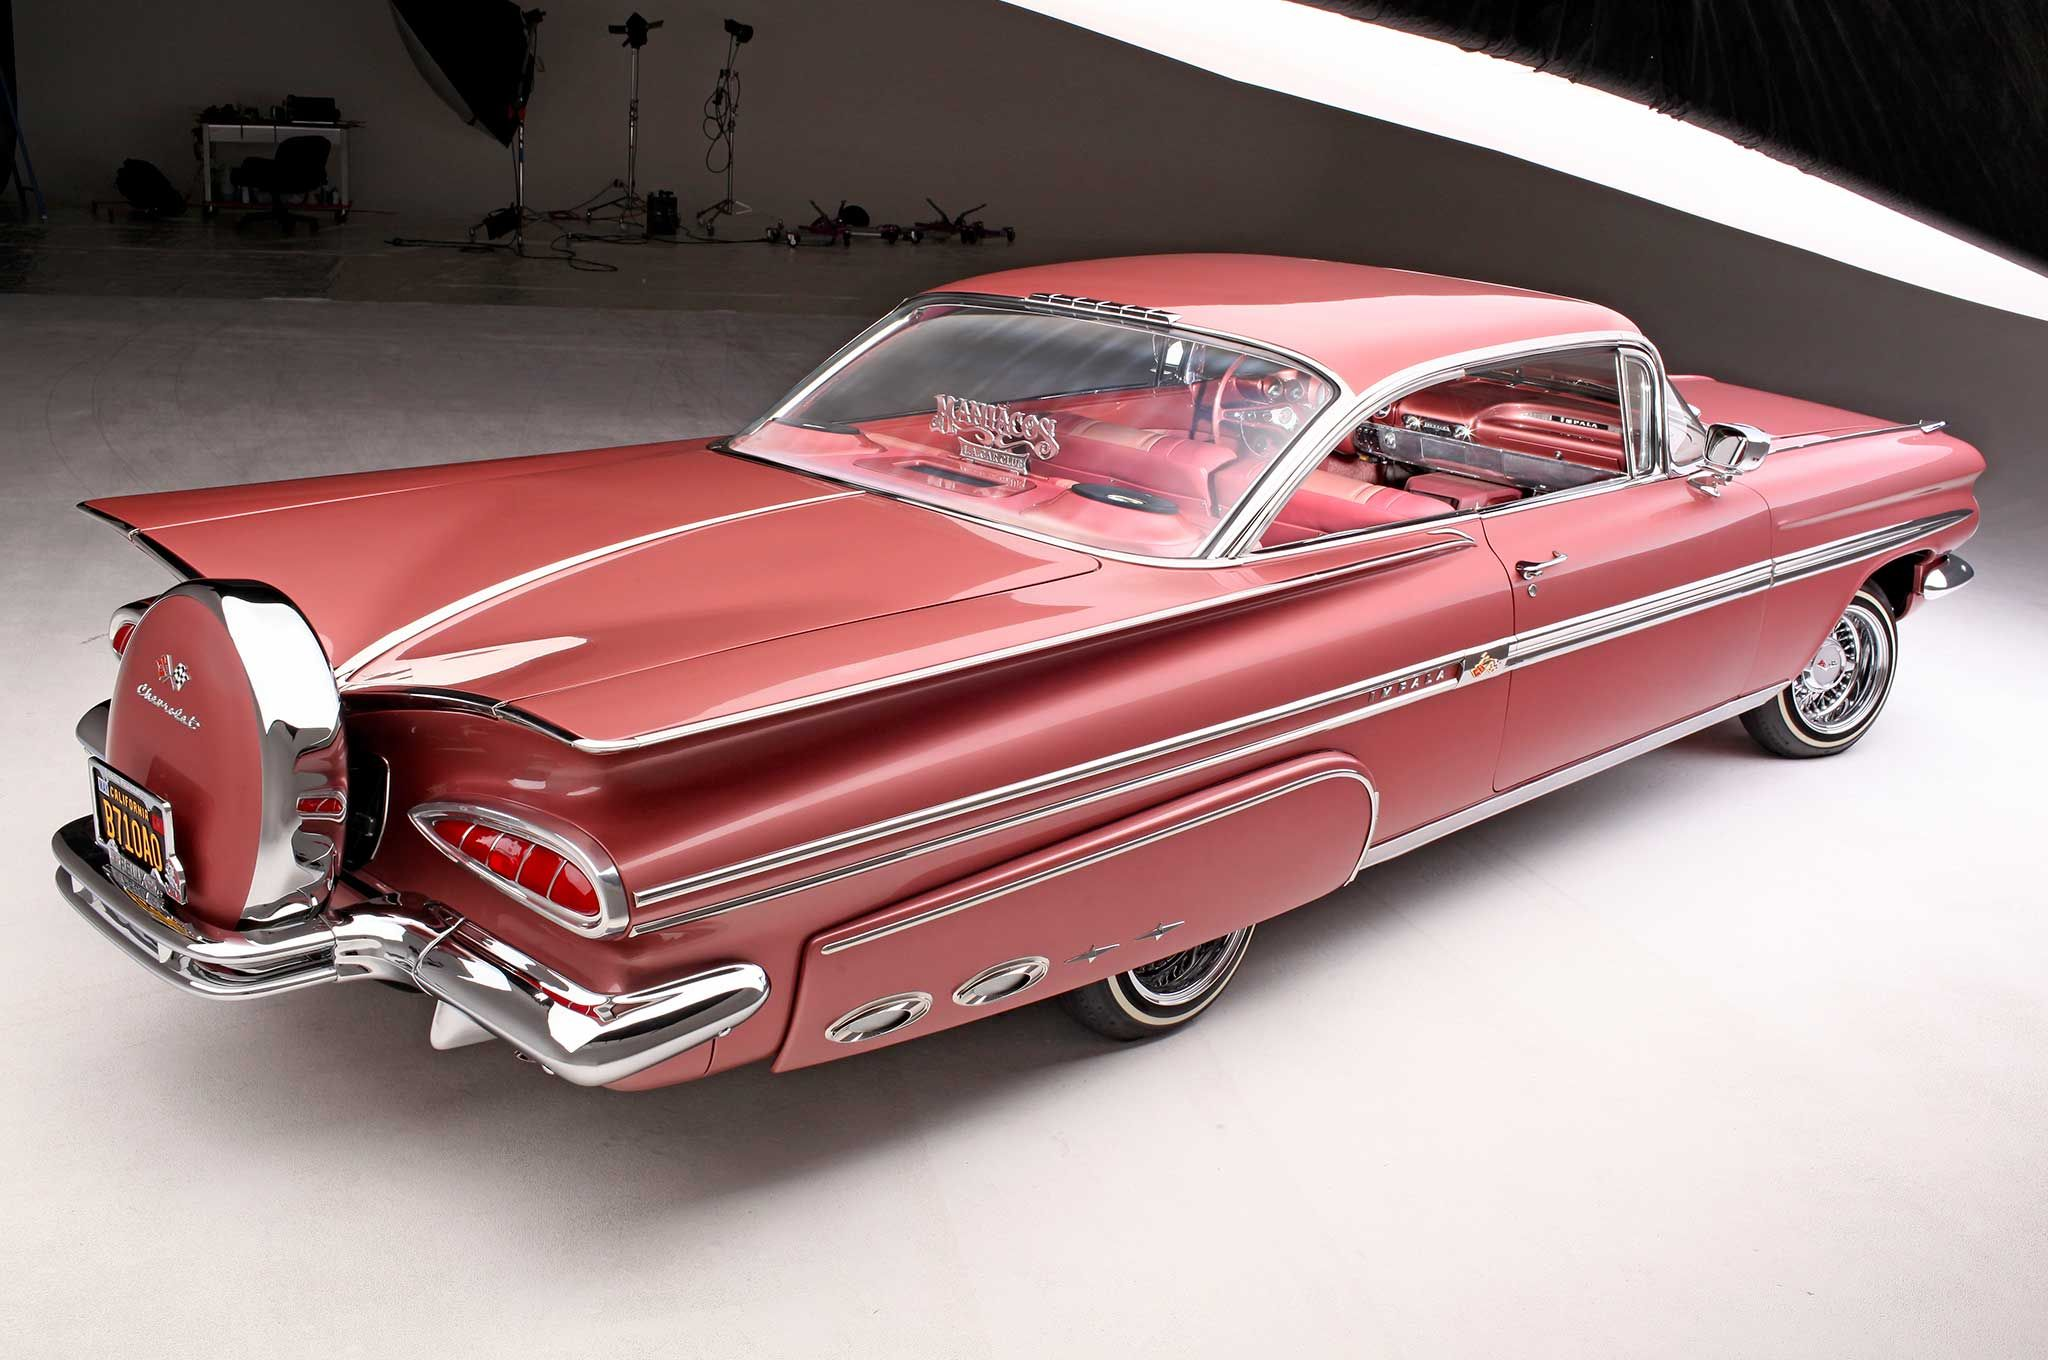 medium resolution of 1959 chevrolet impala passenger side rear quarter view 014